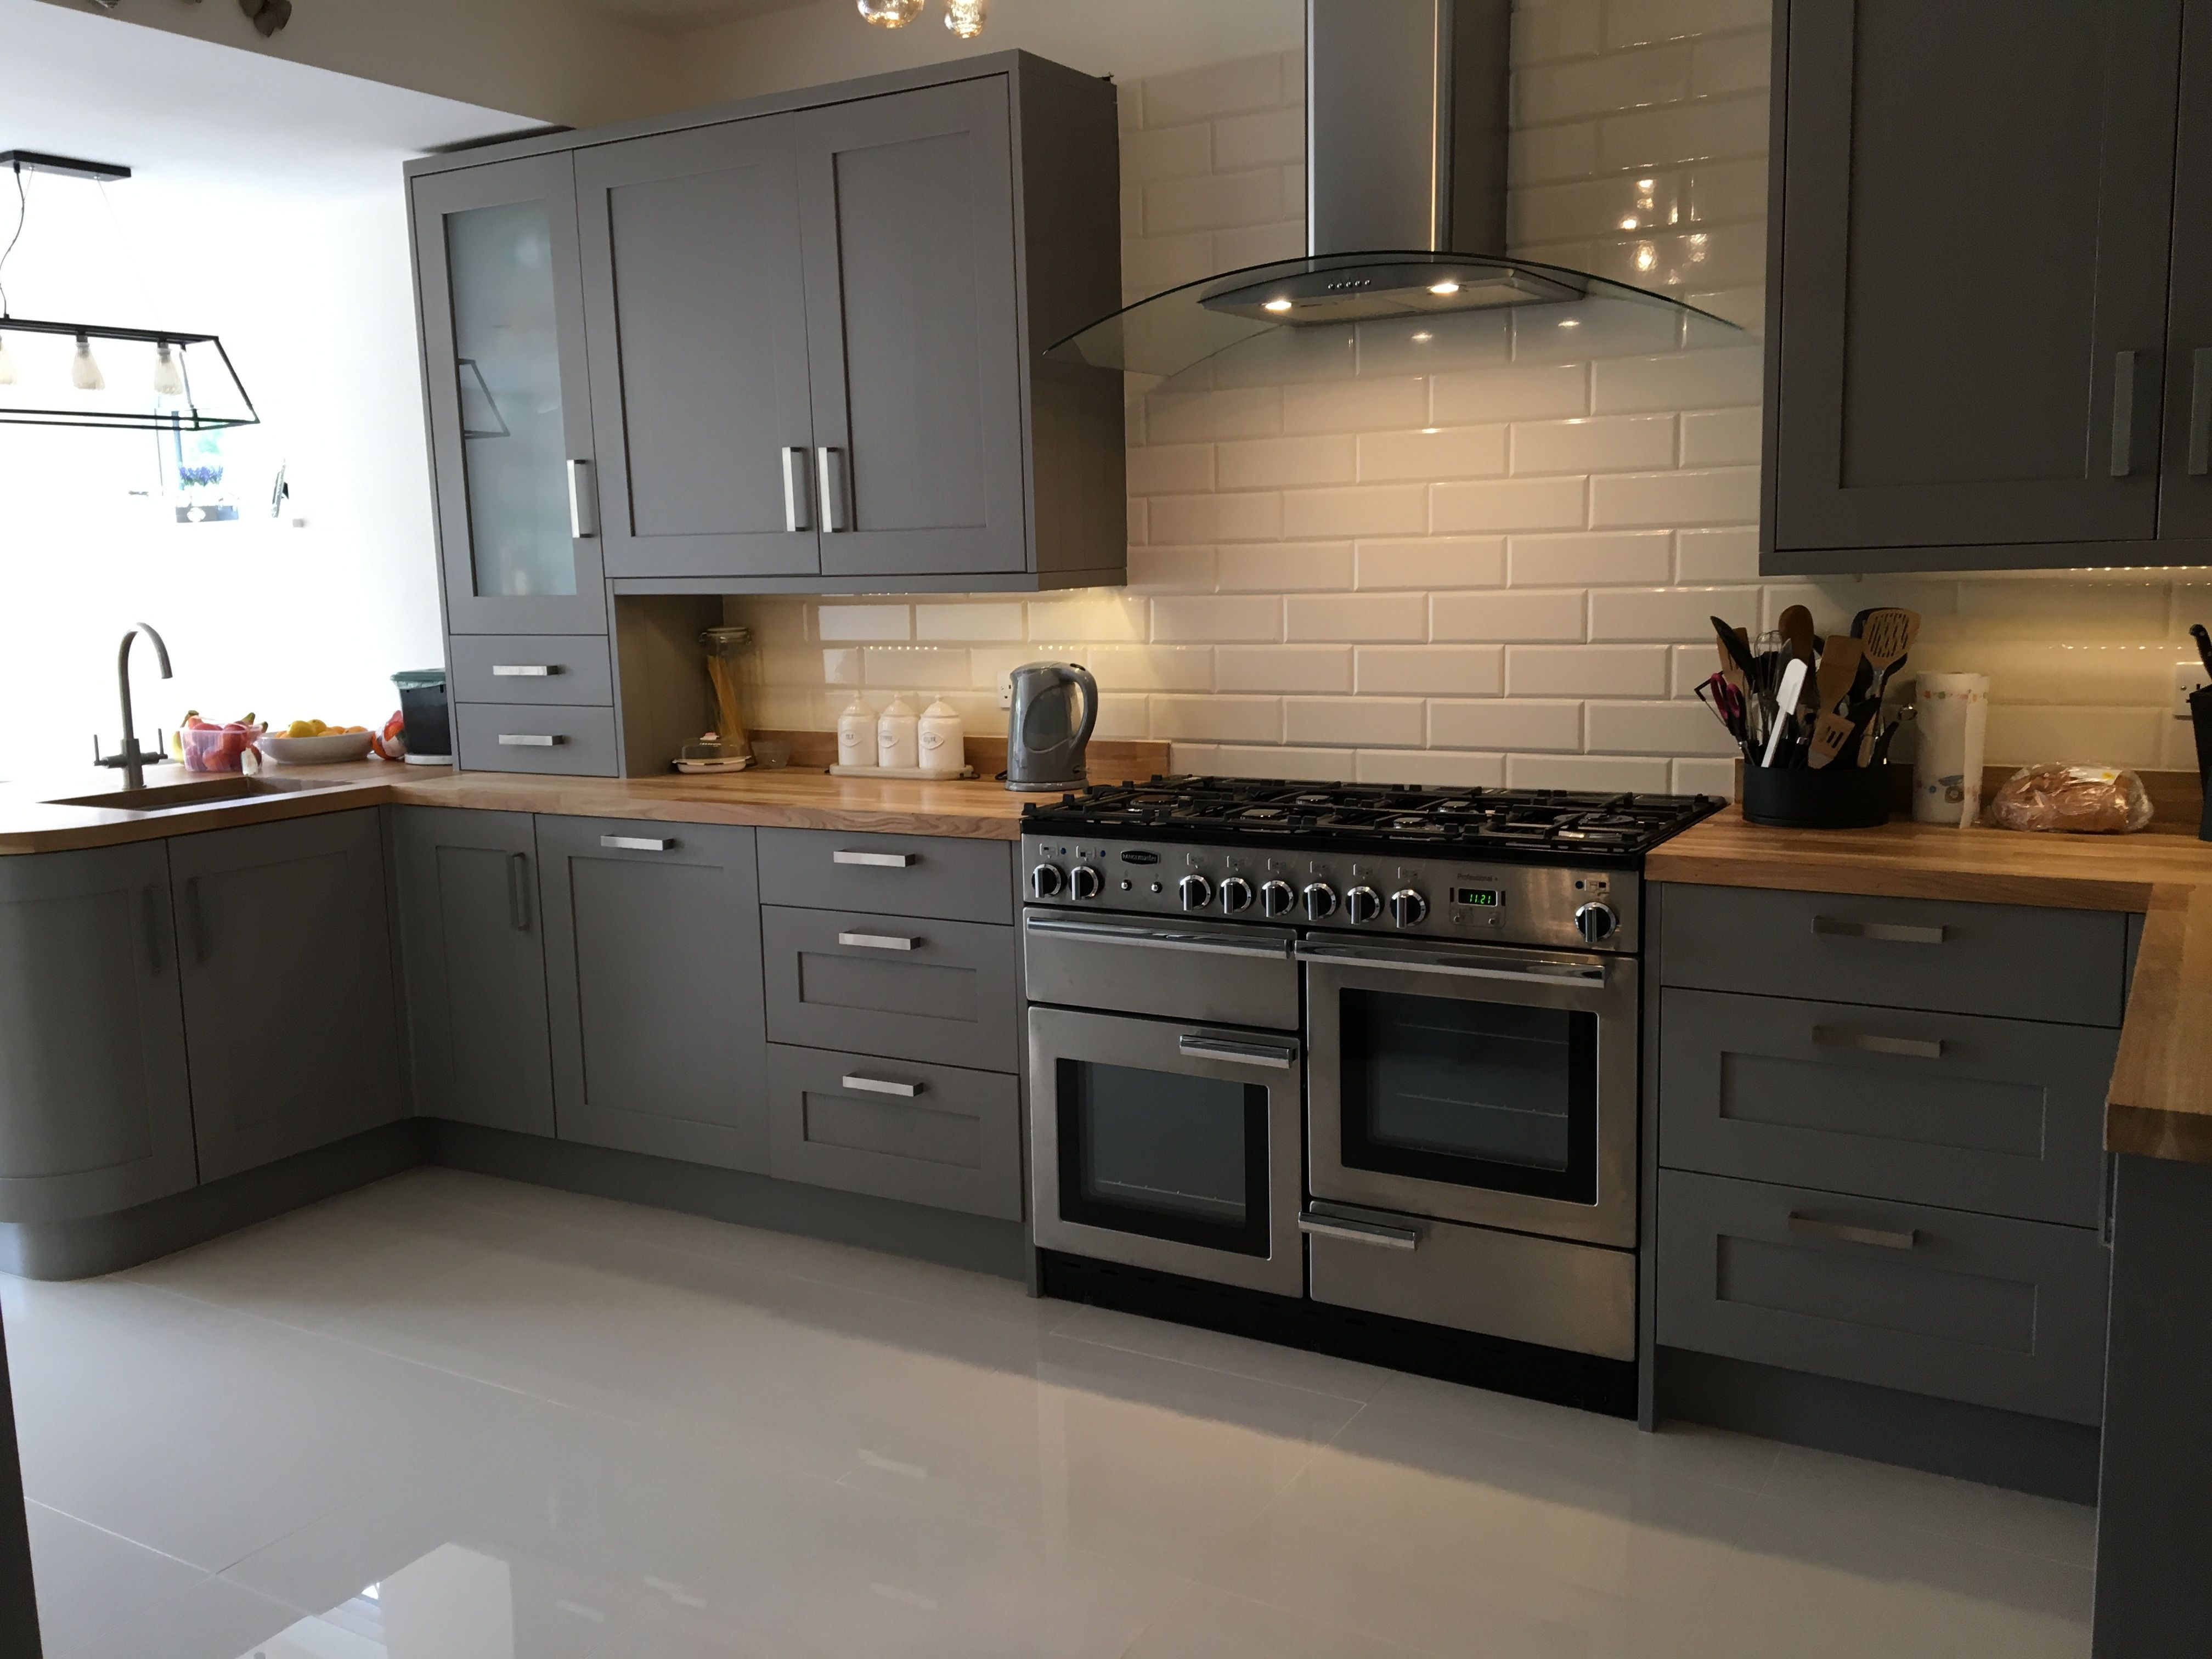 Carisbrook Taupe B & Q Kitchen With Oak Worktops.